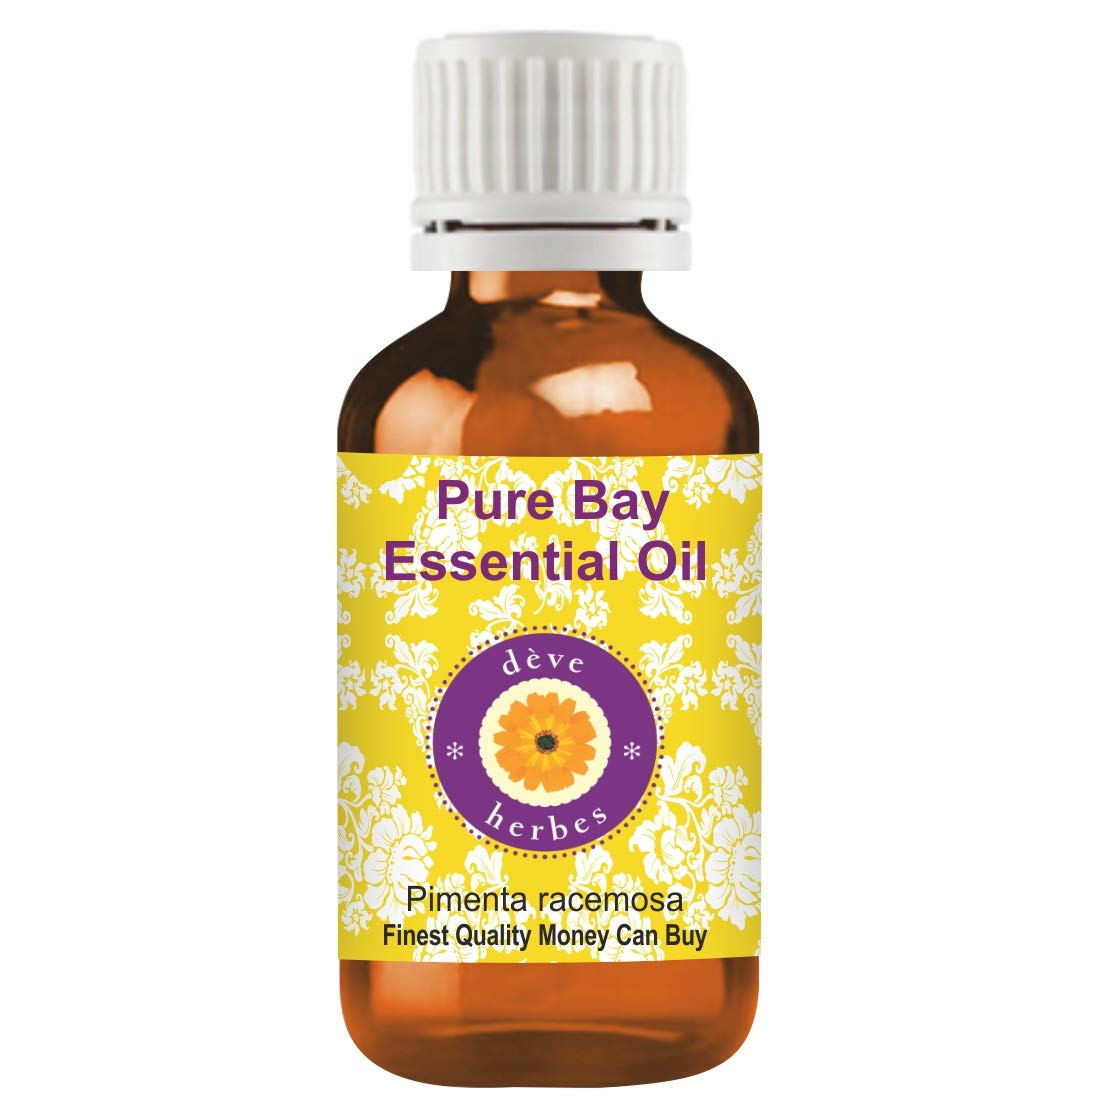 Deve Herbes Pure Bay Essential Oil (Pimenta racemosa) 100% Natural Therapeutic Grade Steam Distilled 30ml (1.01 oz)